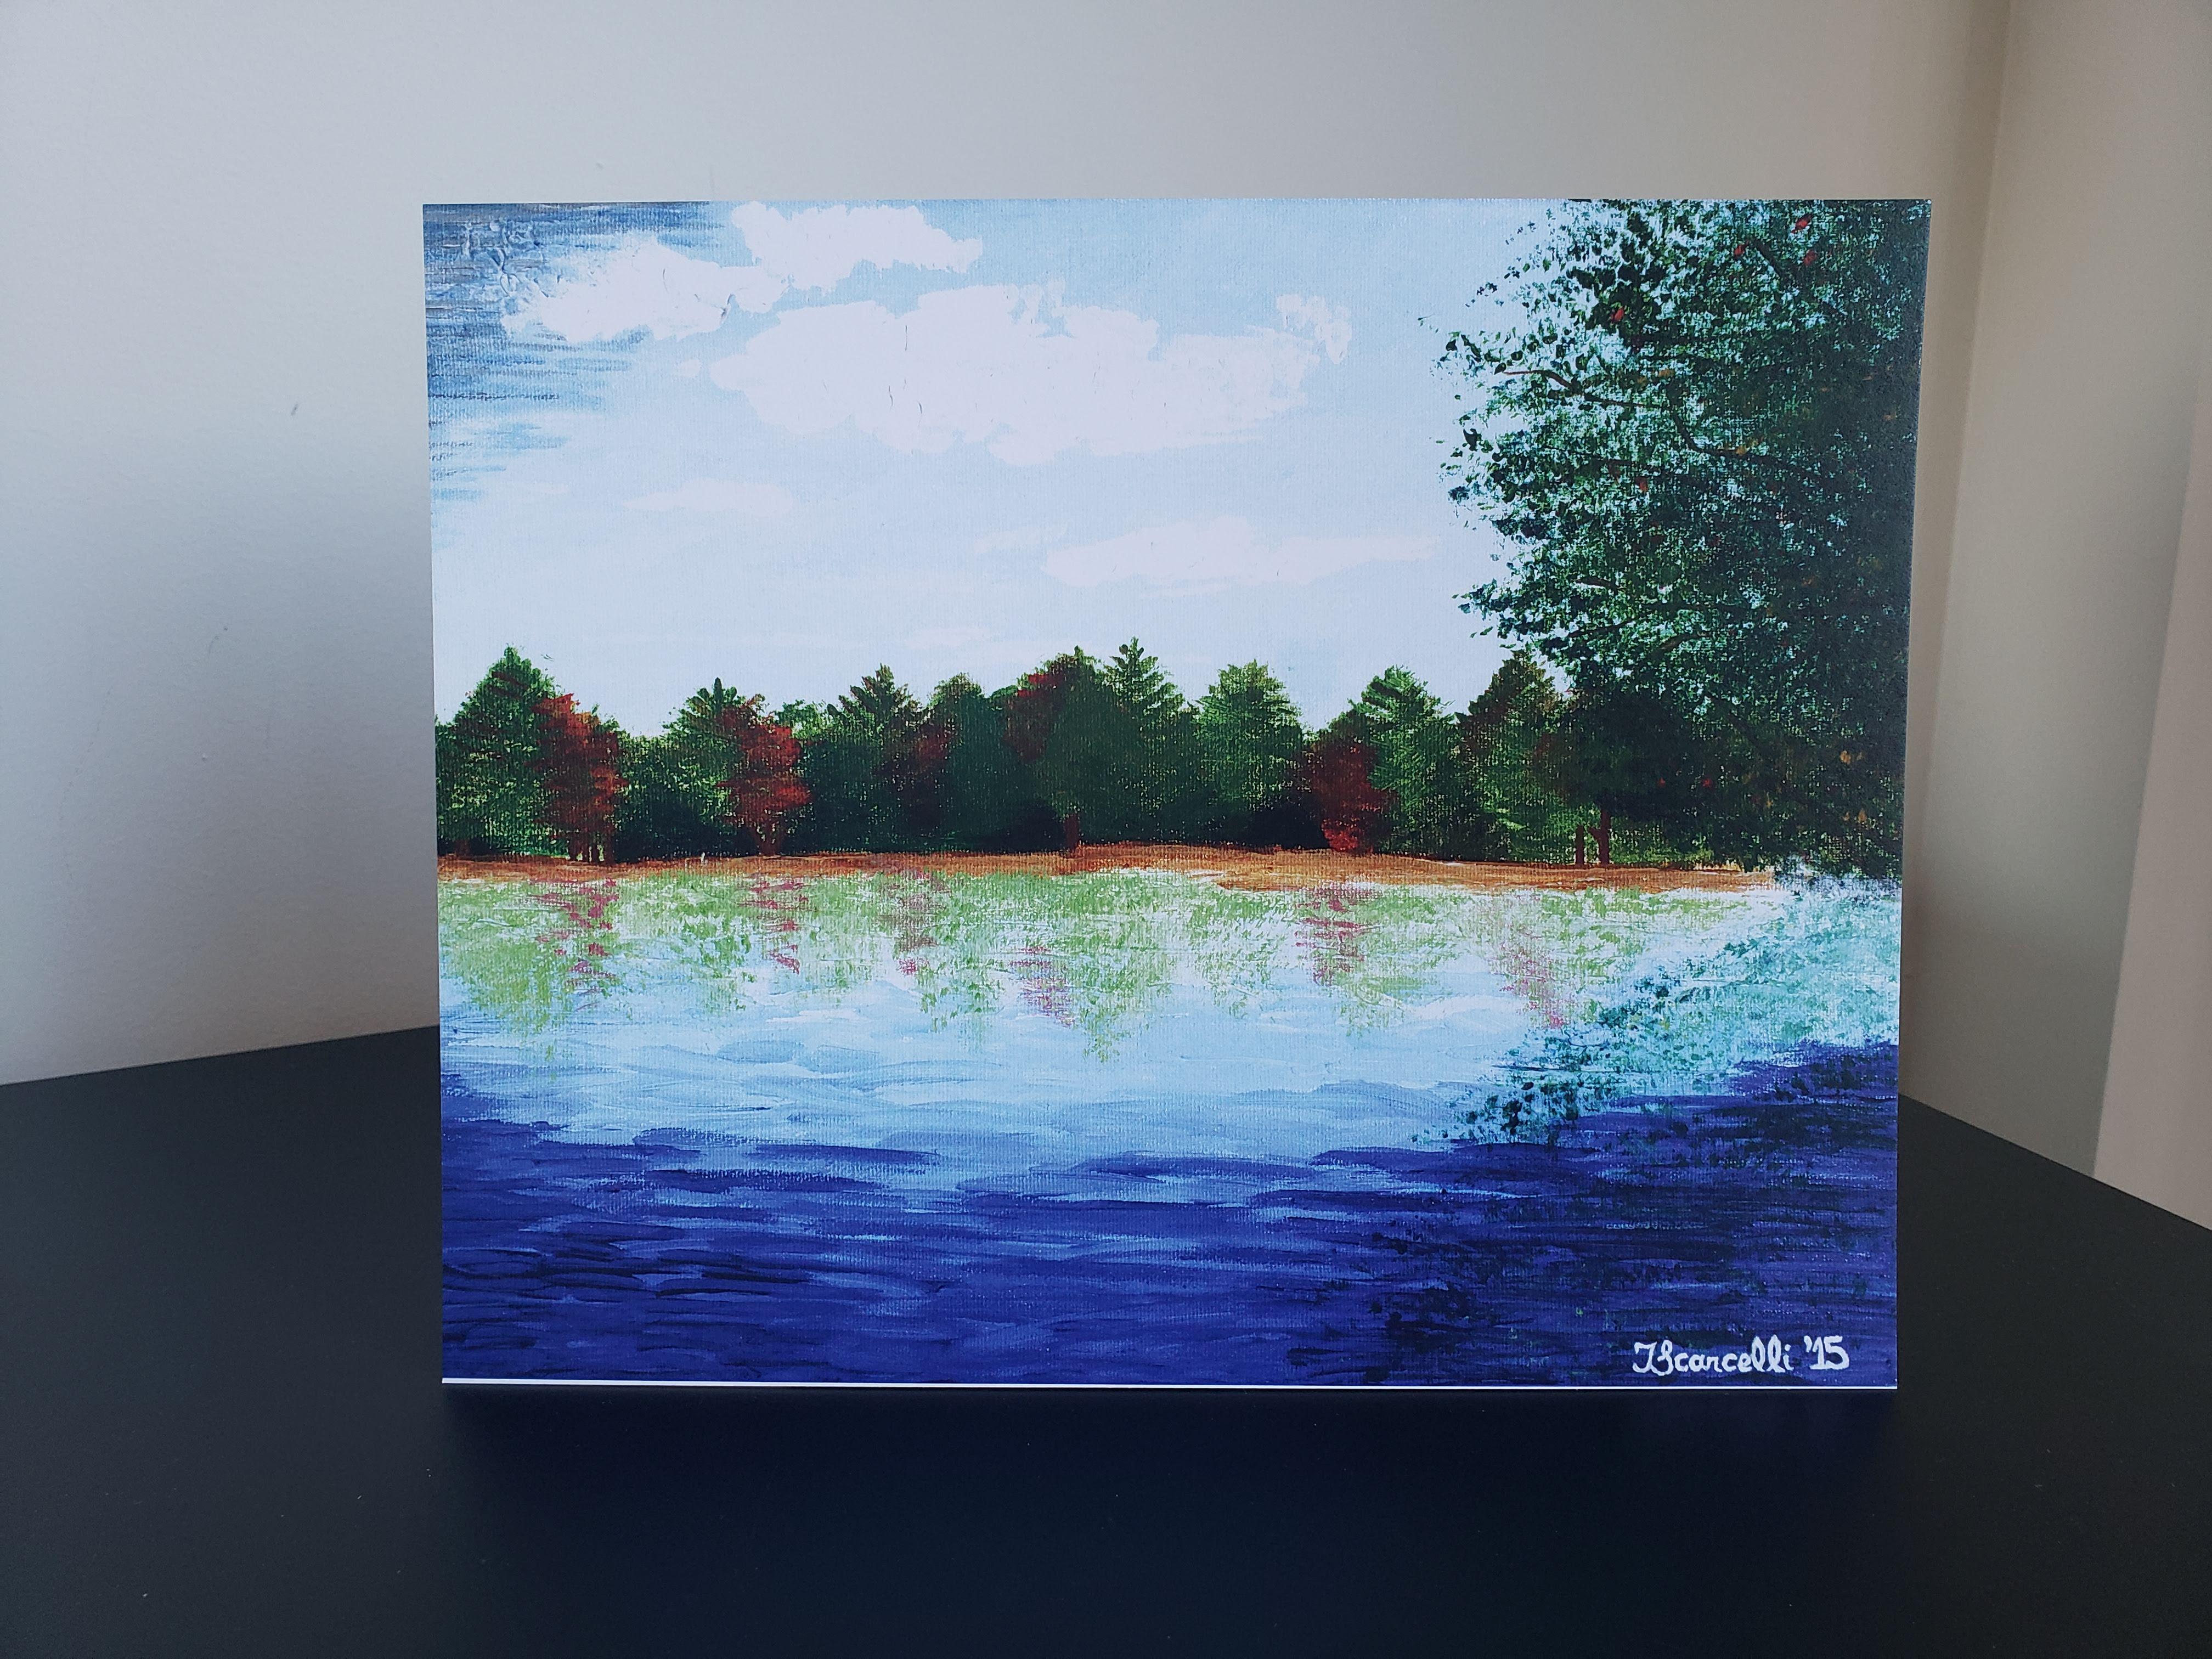 My Story Lake I (20`5)